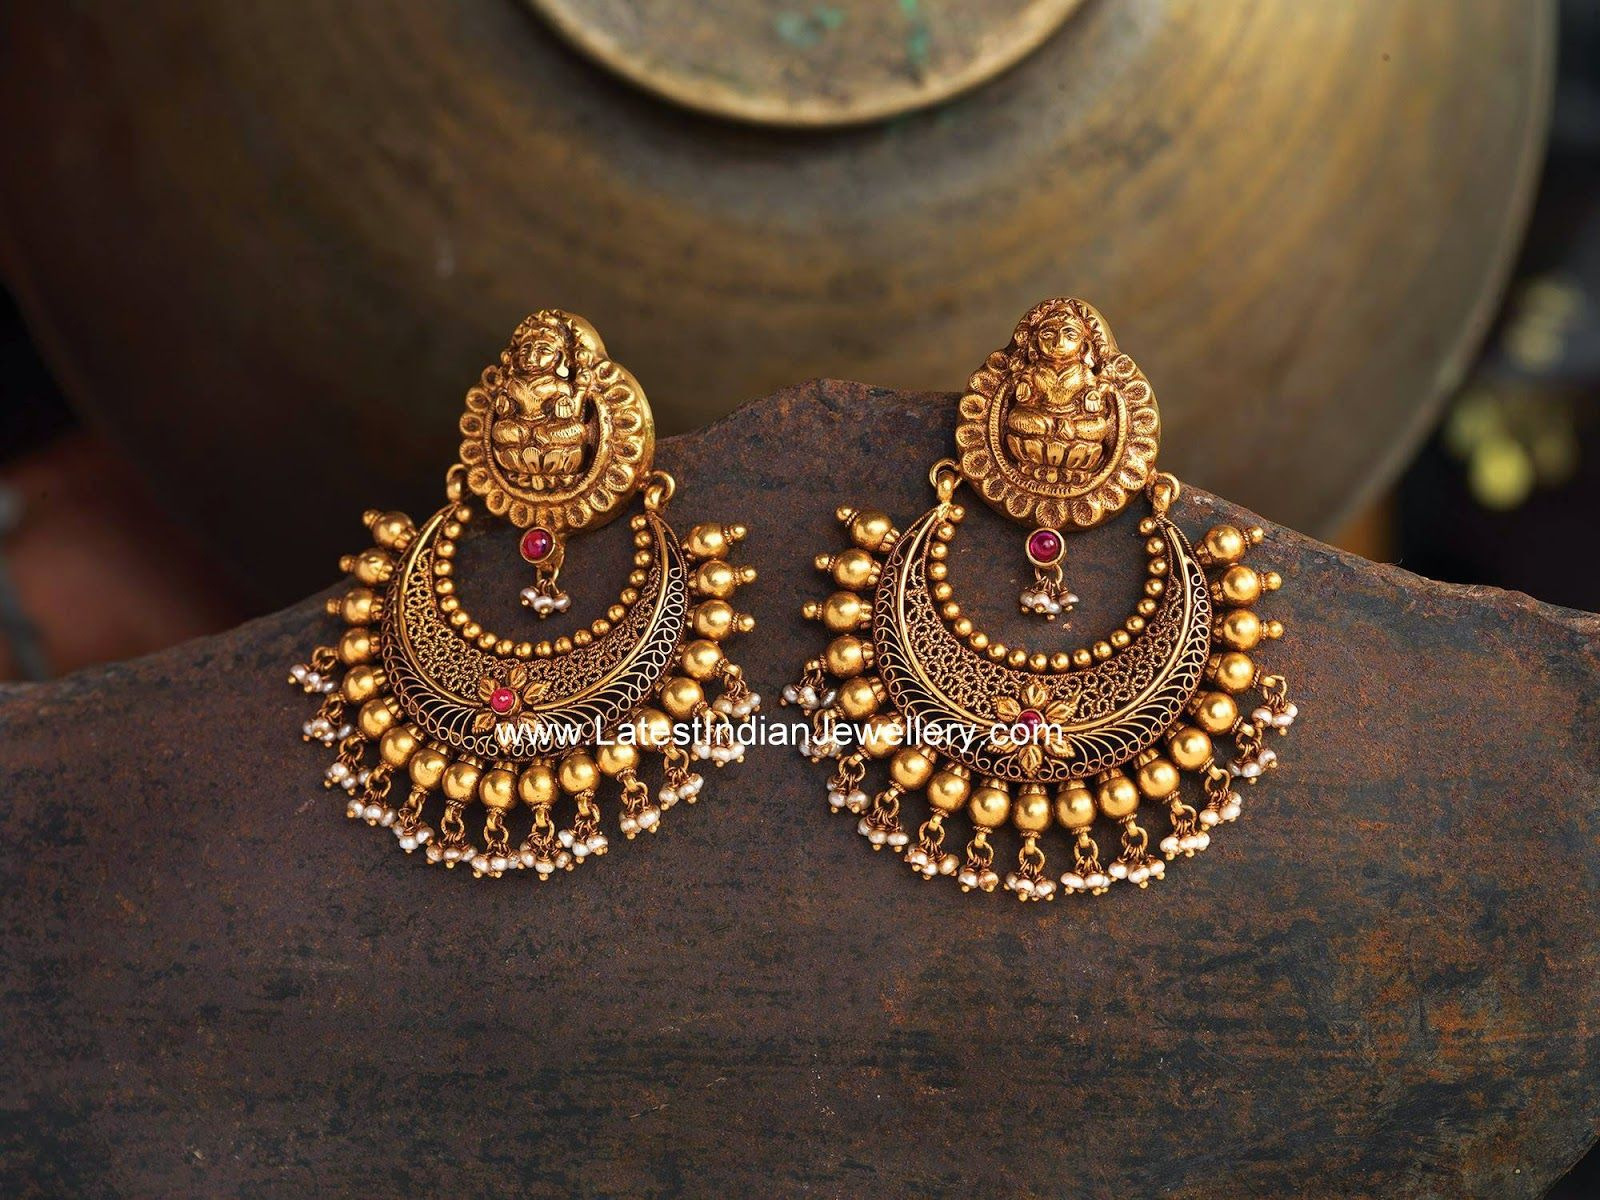 Lakshmi Design Antique Gold Chand Bali Indian Jewelry